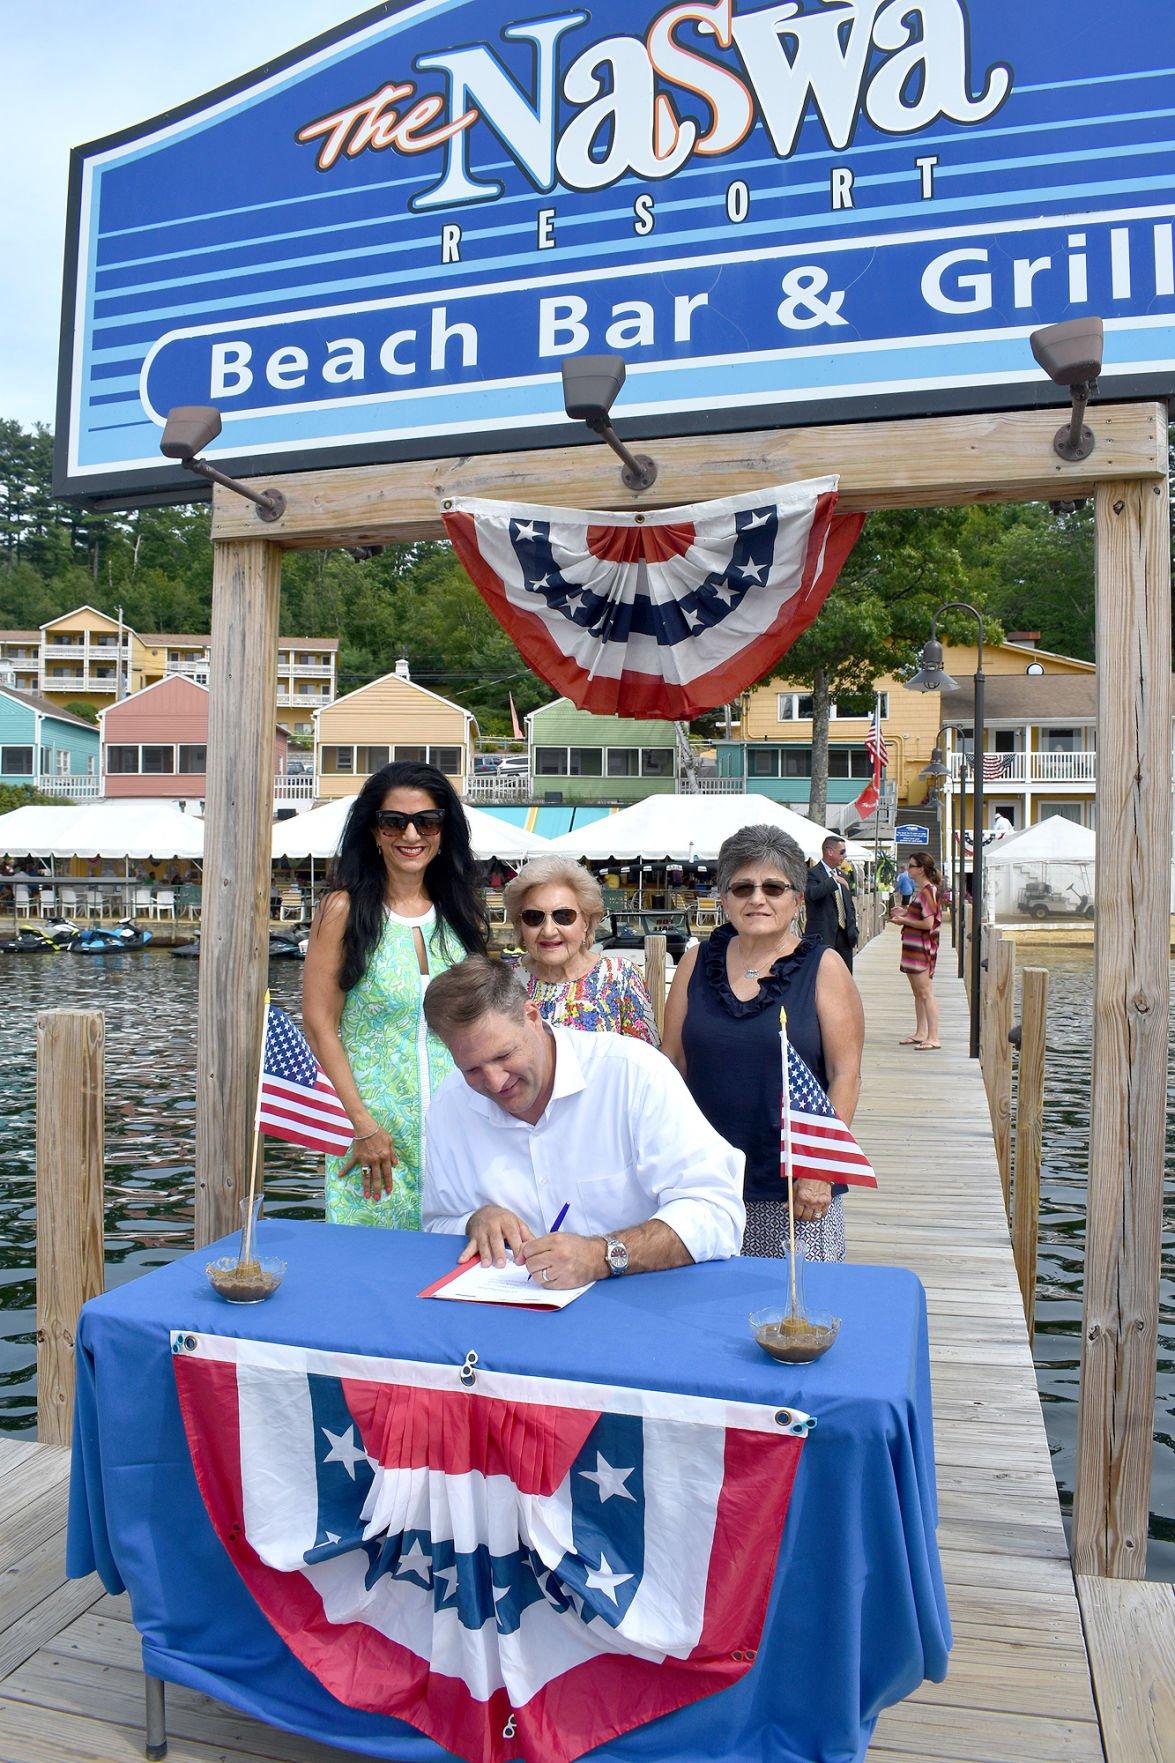 08-13 Naswa Governor signing